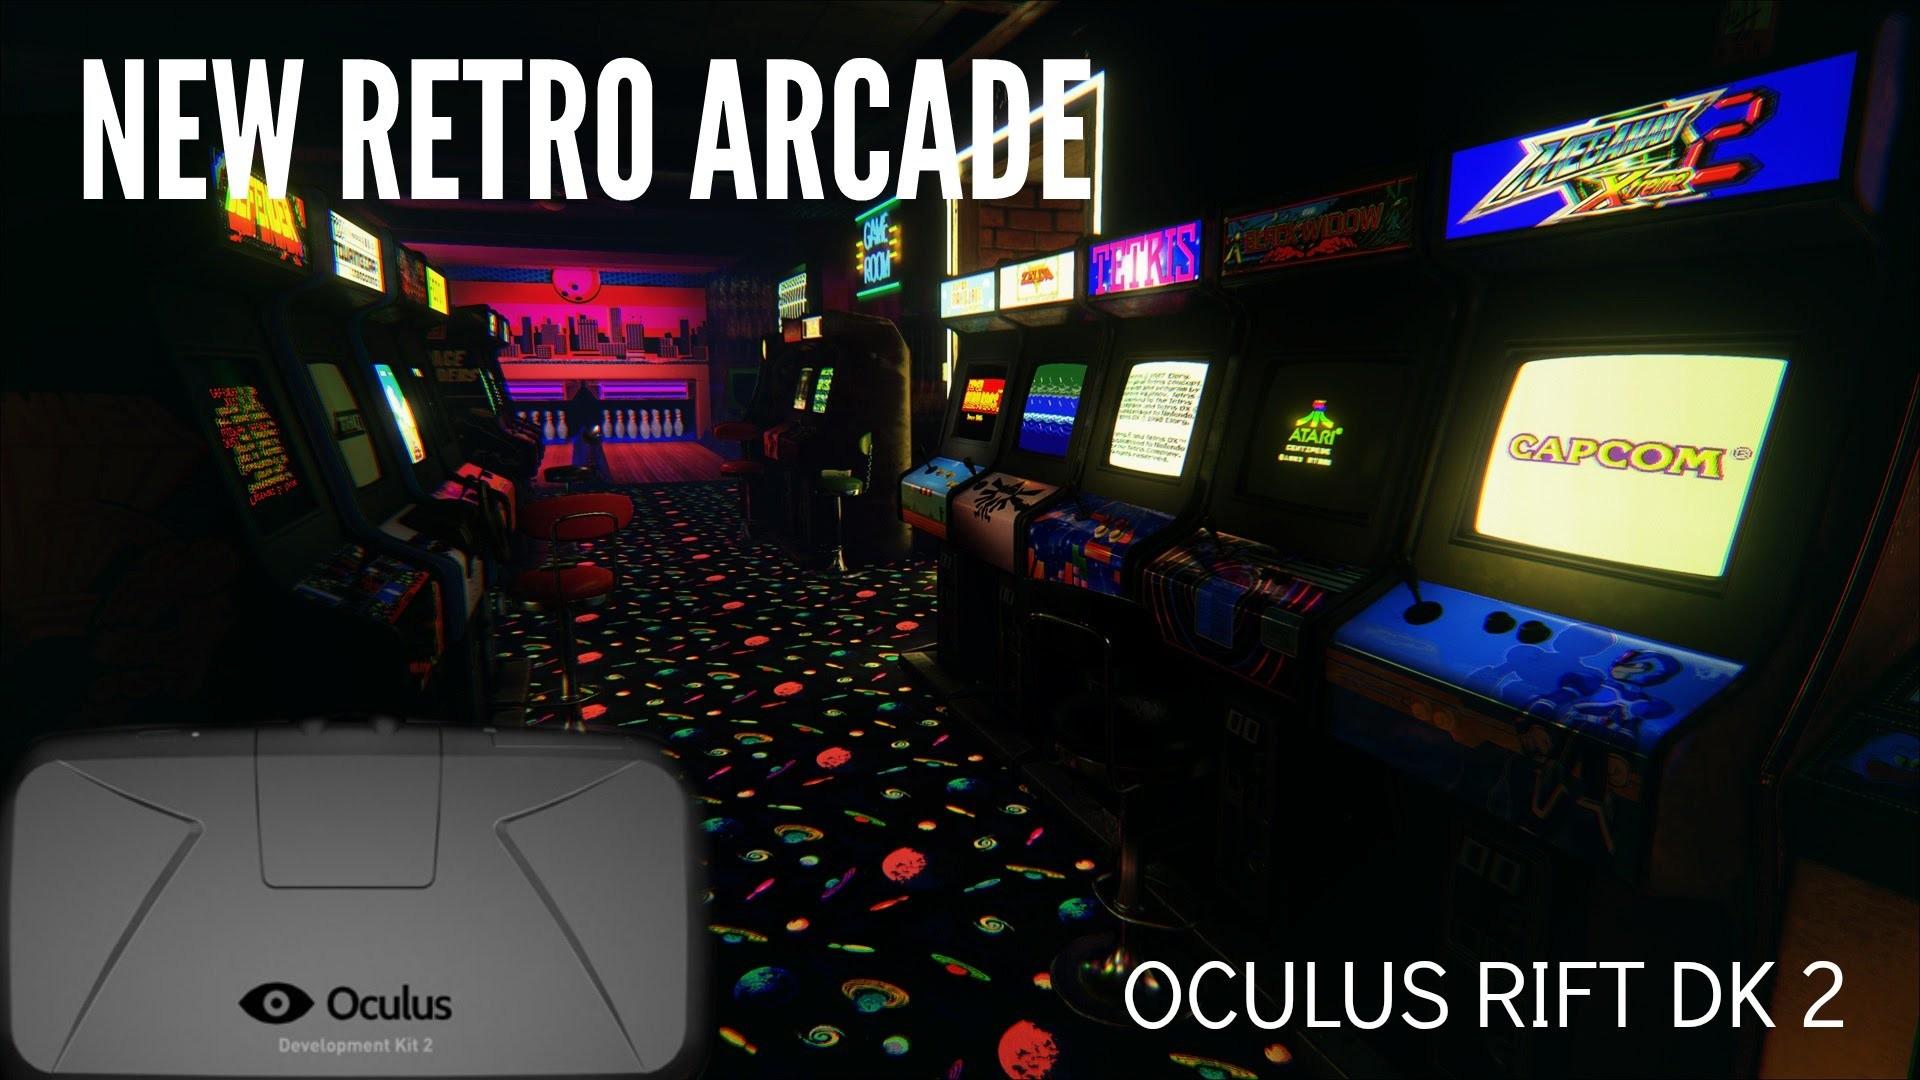 NEW RETRO ARCADE (Oculus Rift Dk2) Your very own arcade hall – Gameplay